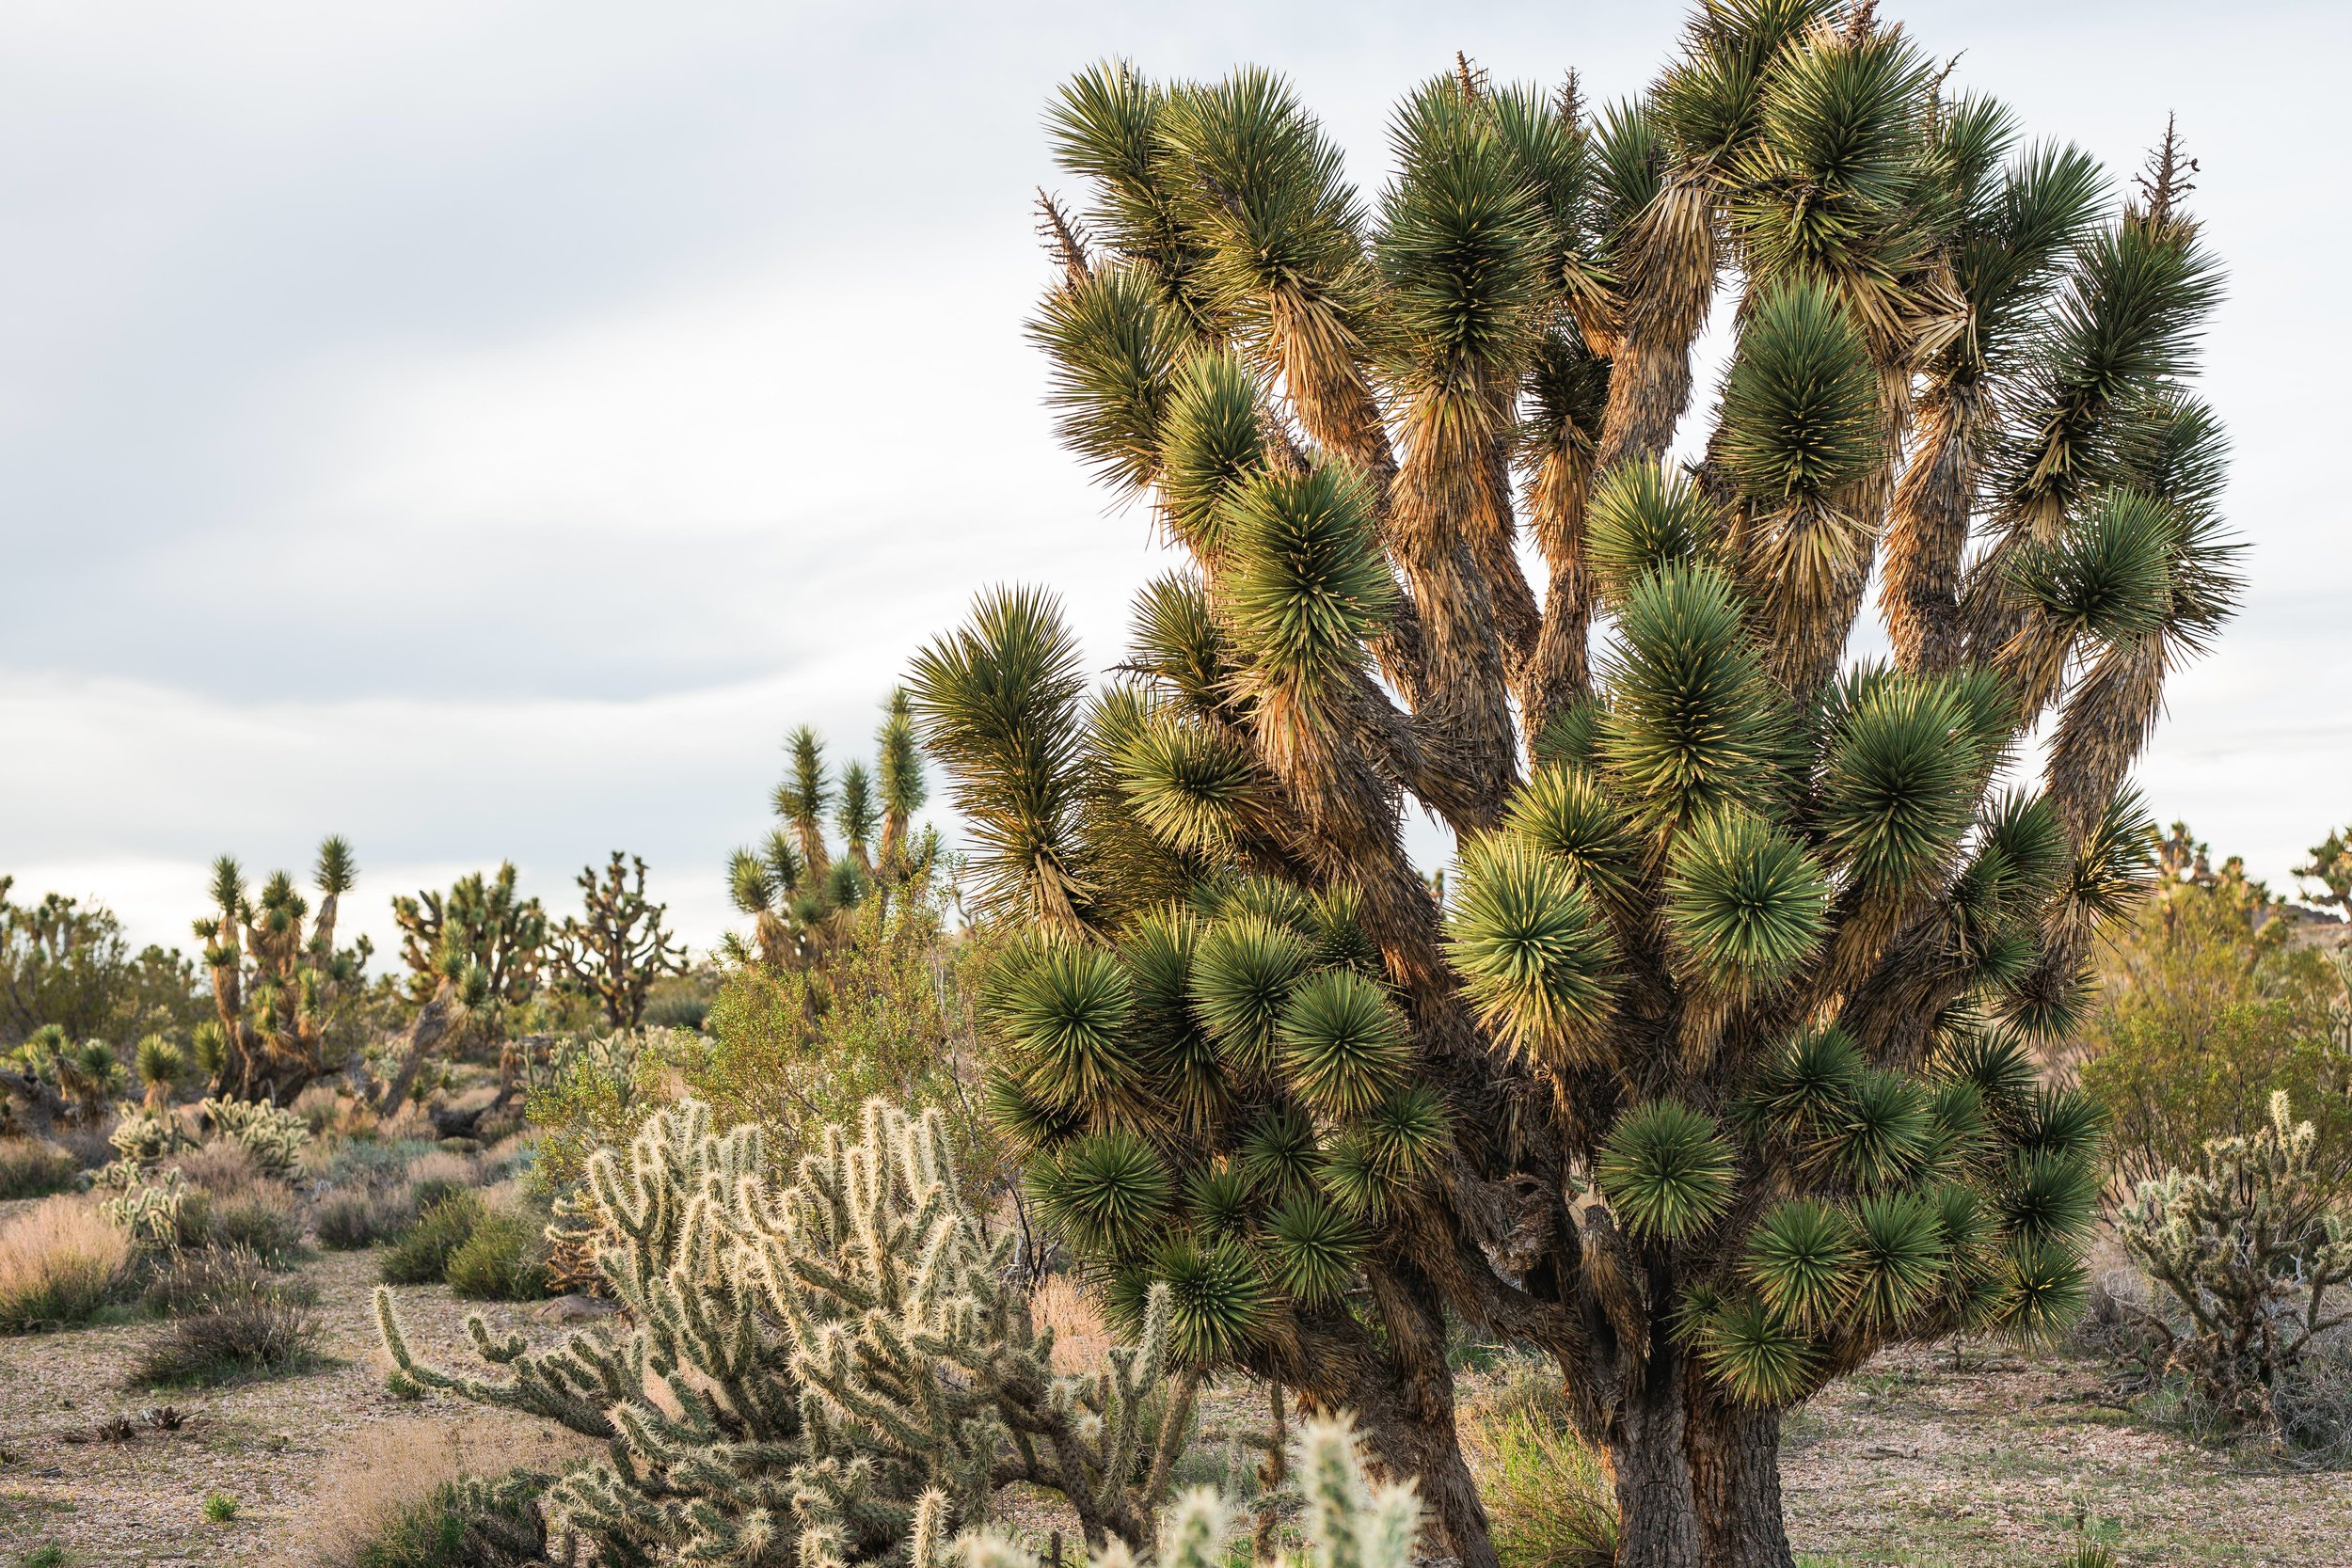 Joshua tree cactus scenic detail desert landscape Kyle Loves Tori Photography